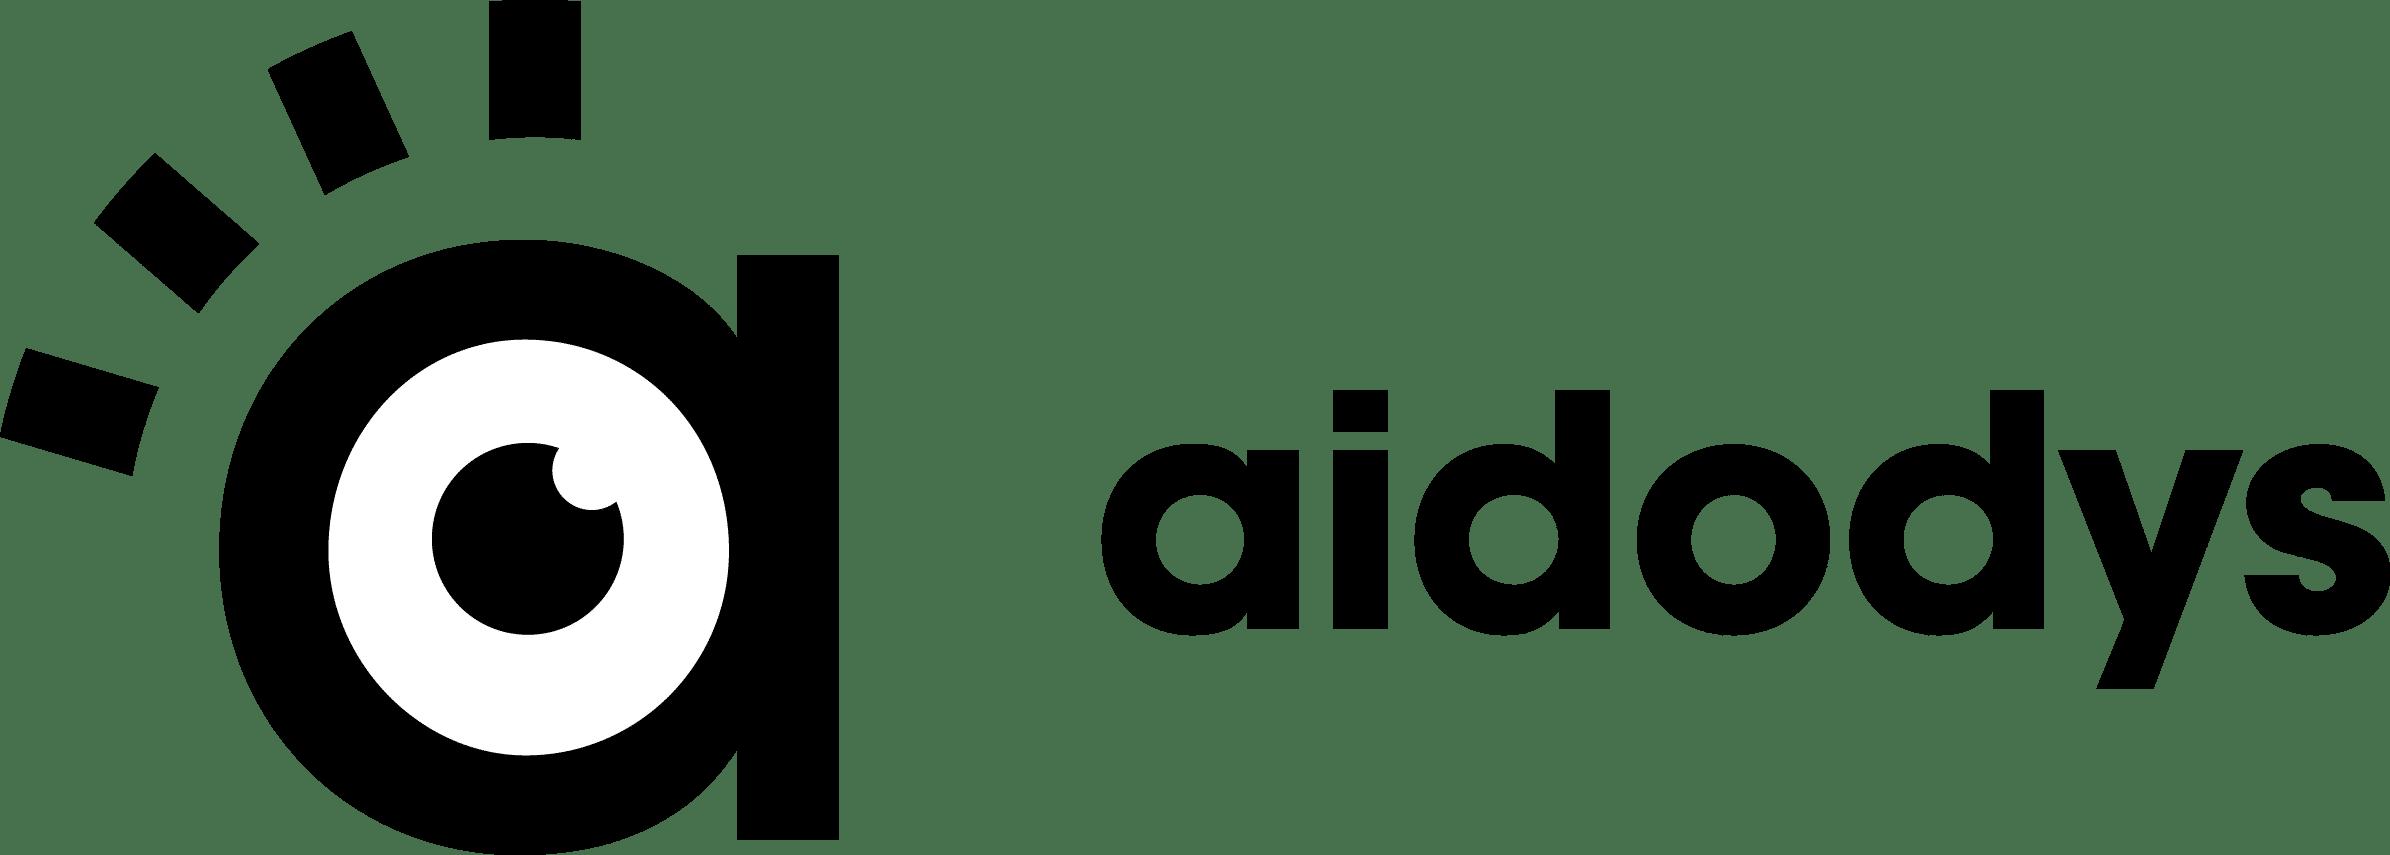 Aidodys